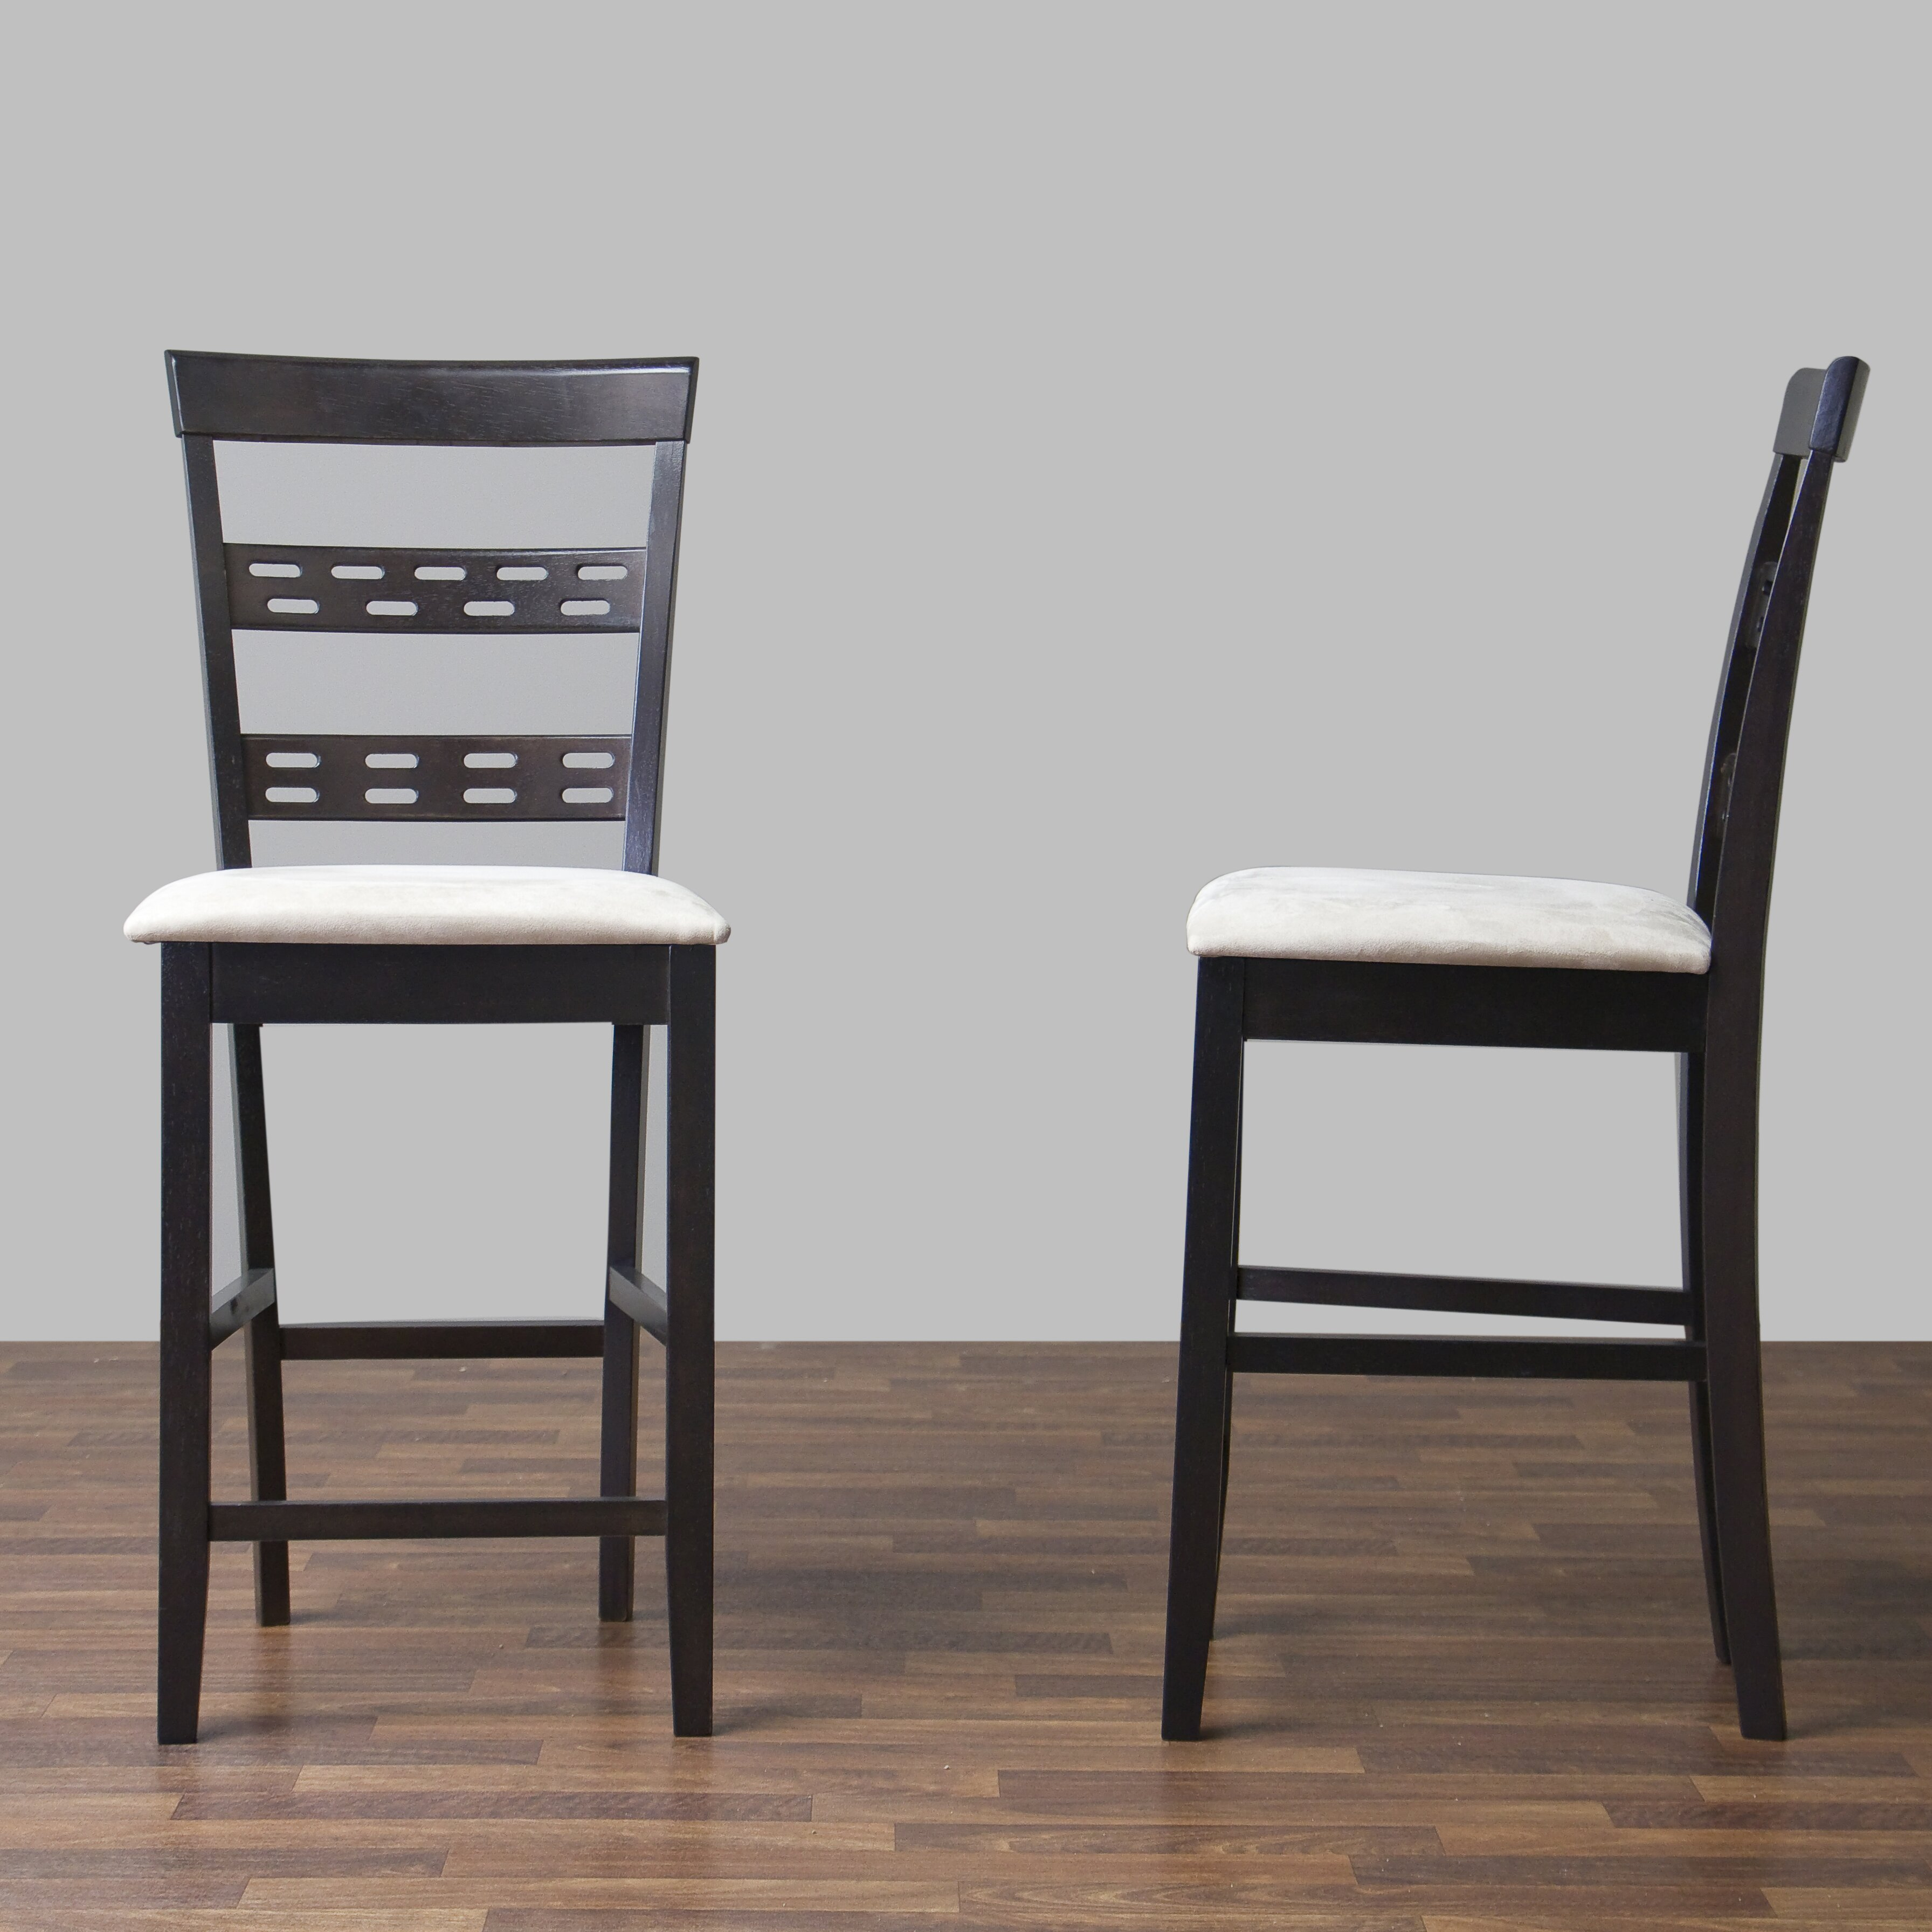 "Bar Furniture By Baxton Studios: Wholesale Interiors Baxton Studio 24"" Bar Stool & Reviews"